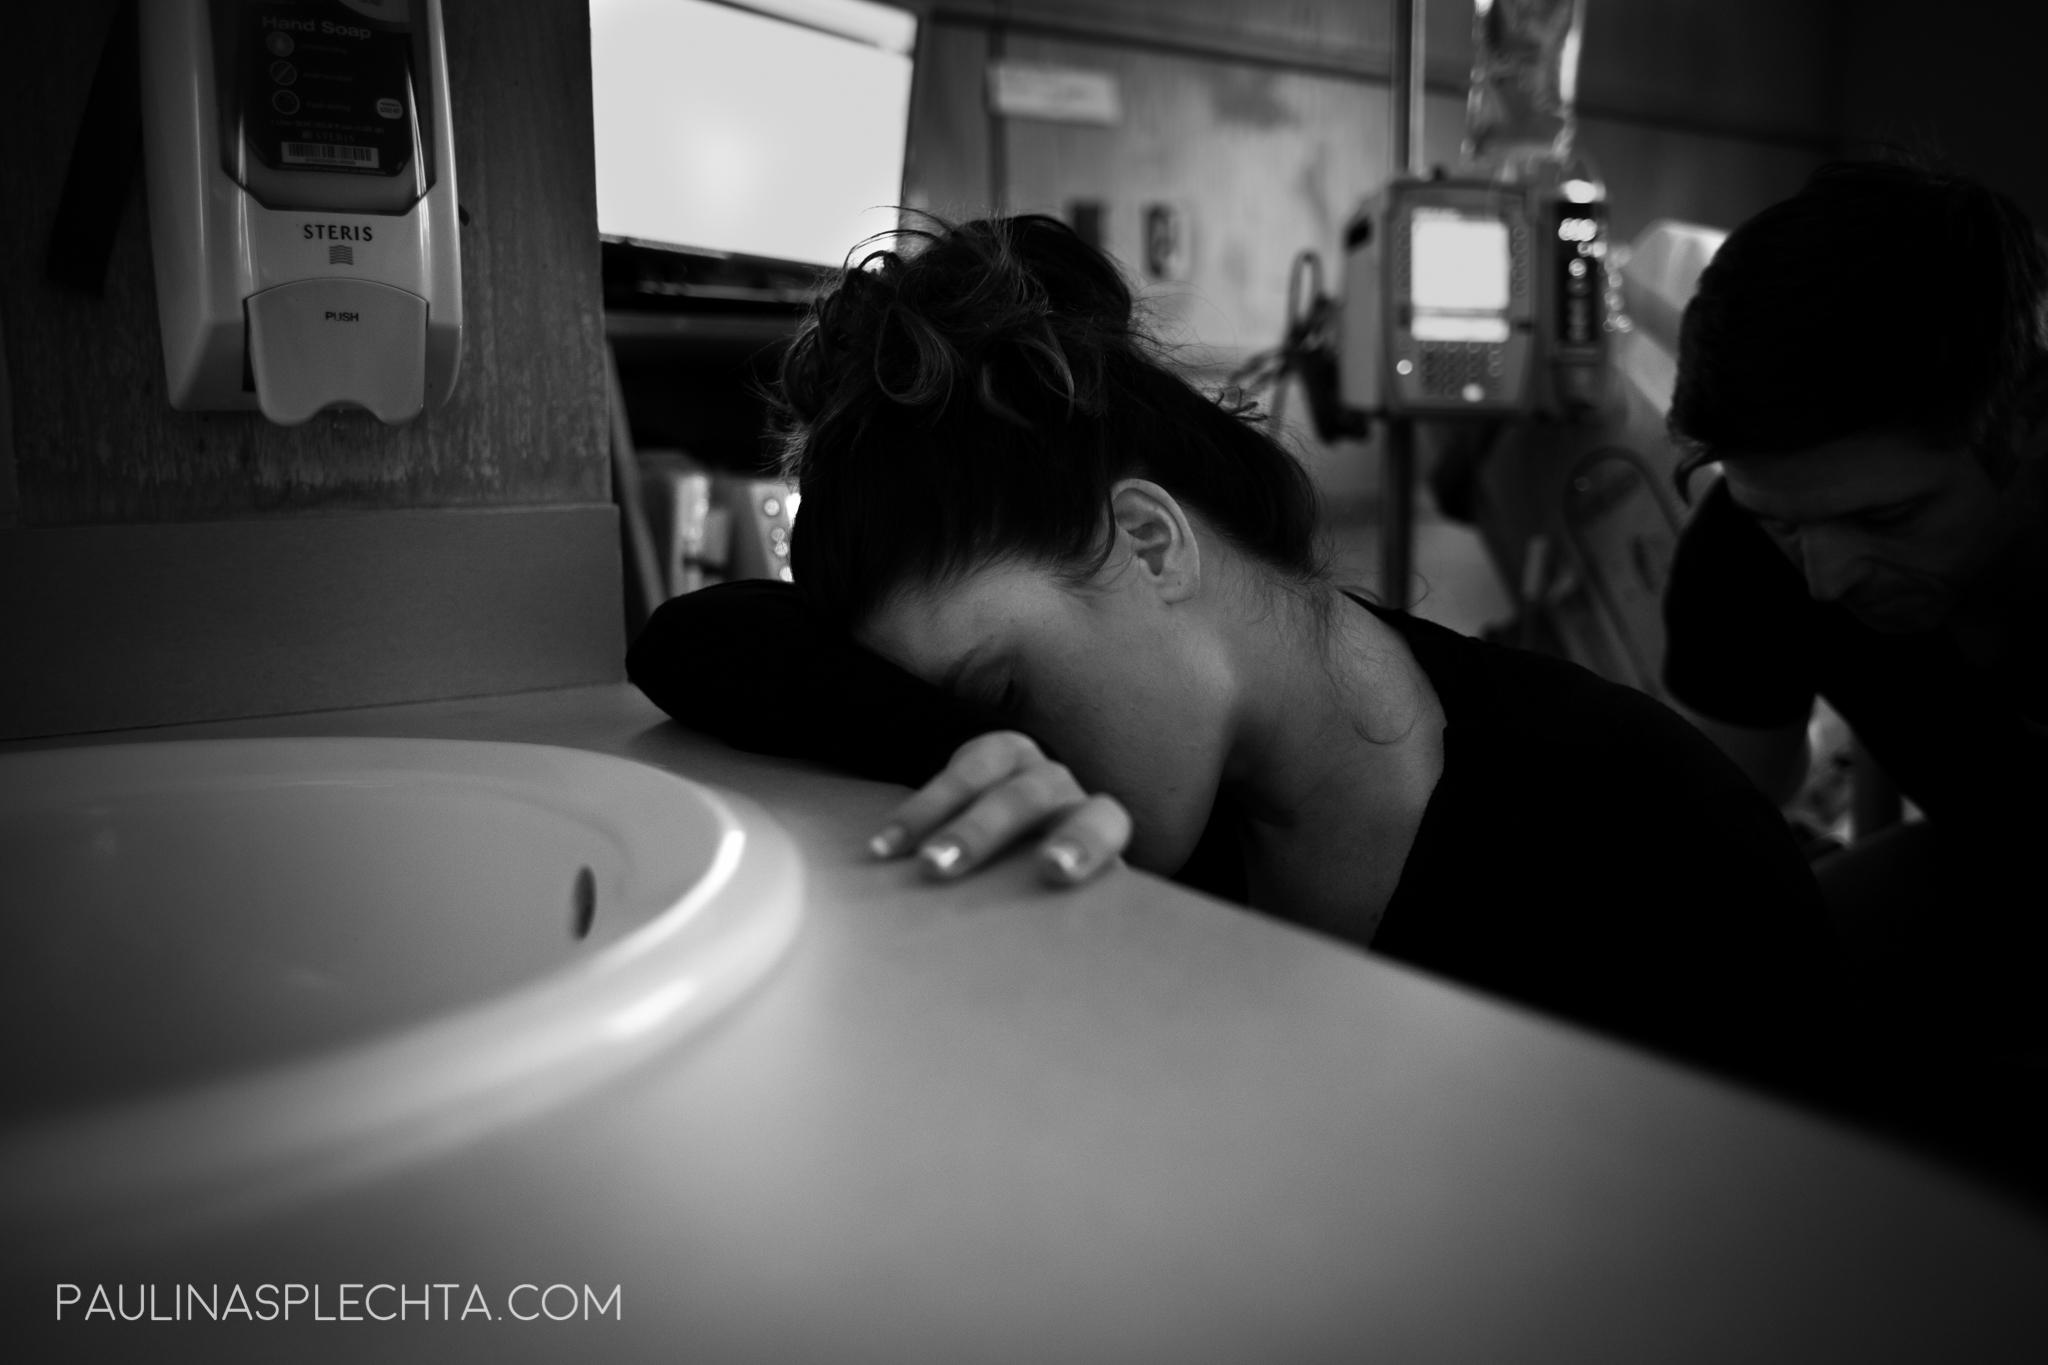 pregnant-duedate-breastfeeding-pregnancytest-pregnancysymptoms-morningsickness-delray-wellington-boynton-deerfieldbeach-northwest-westboca-coralspringsmedicalcenter-vbacmidwife-gestationaldiabetes-induced-lactationconsultant-preggo-edd-20.jpg